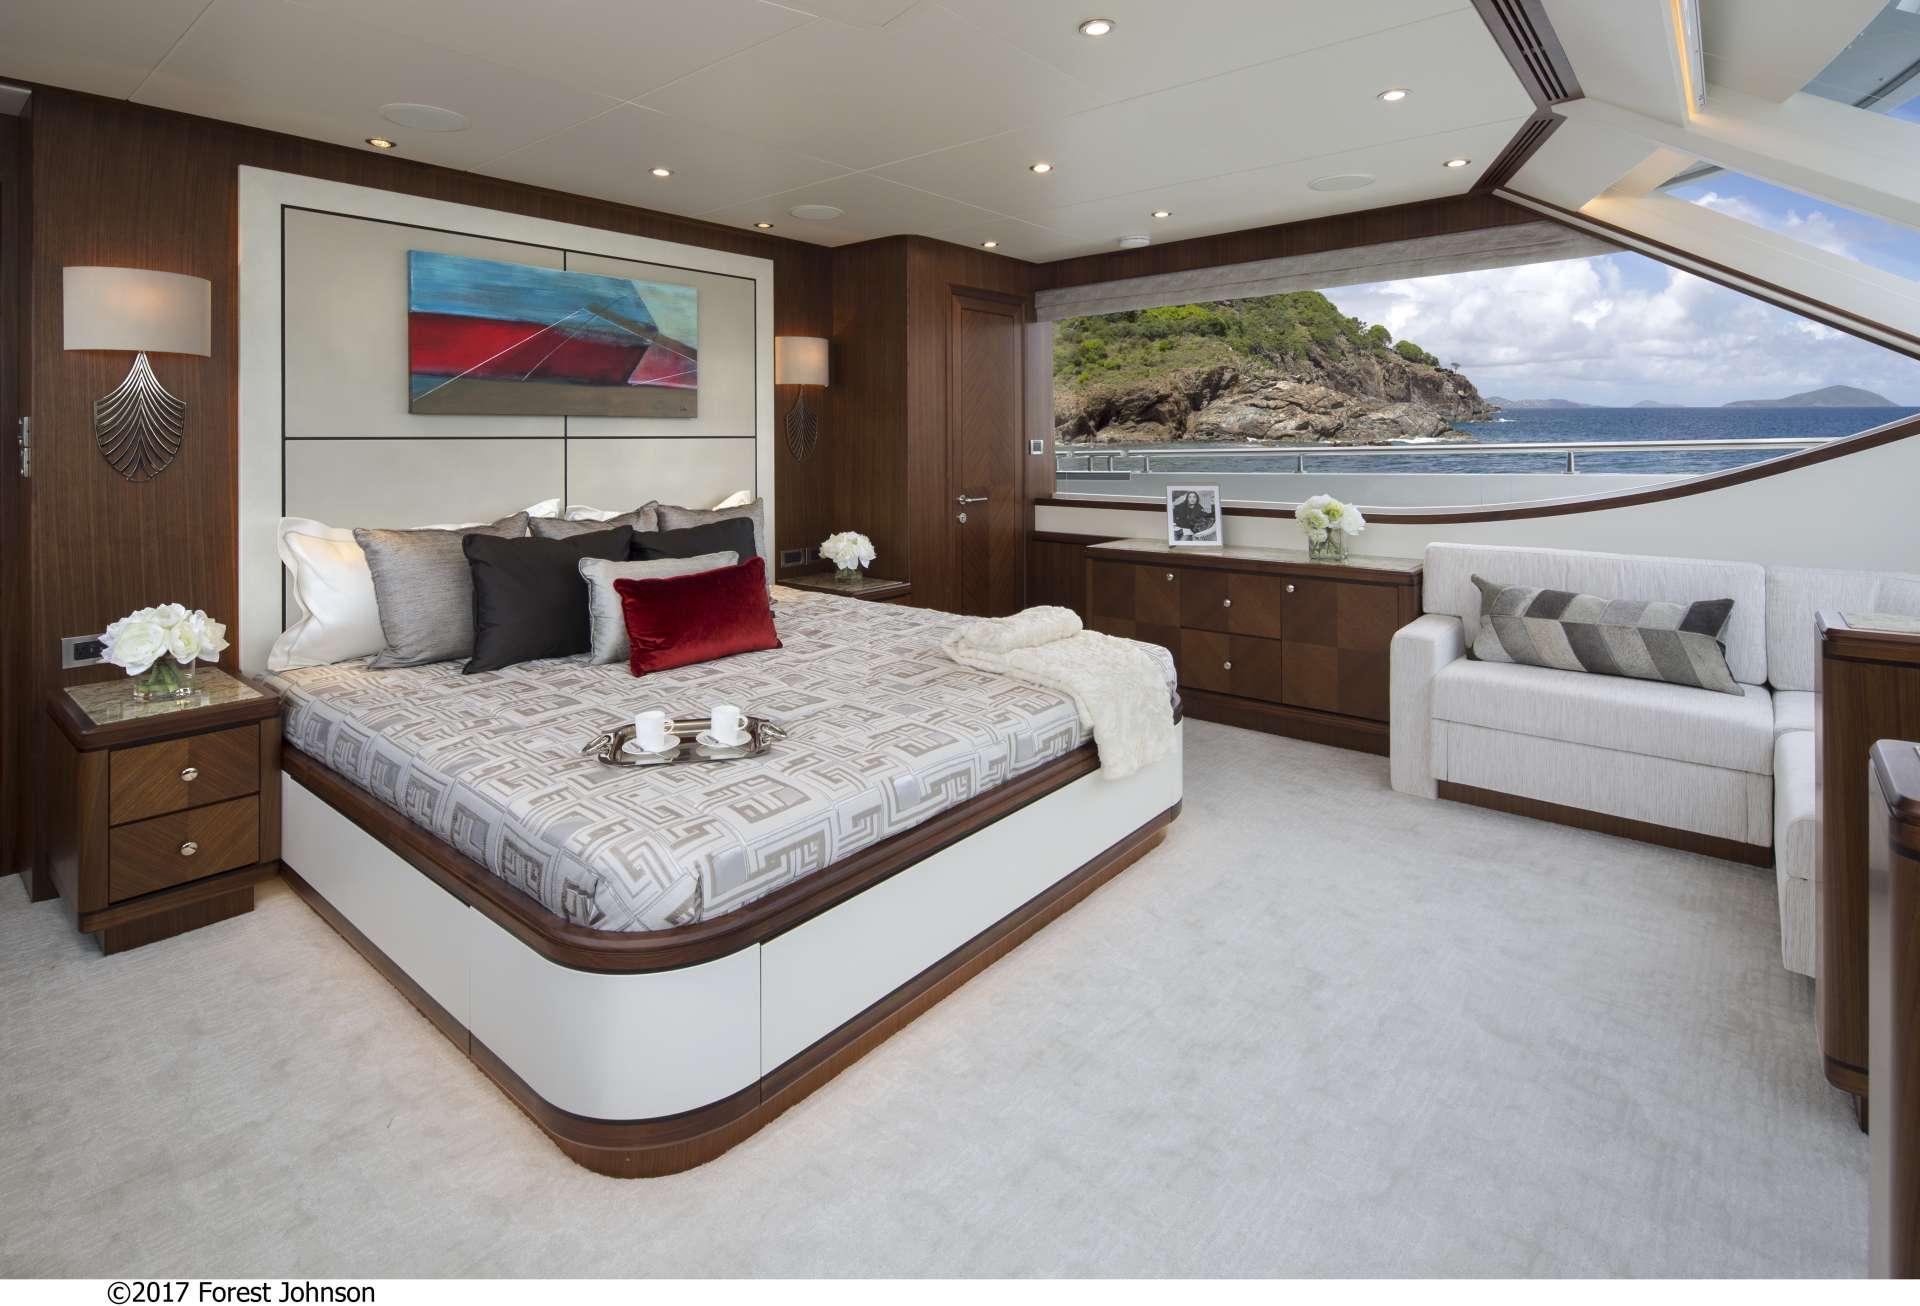 SUGARAY yacht image # 8